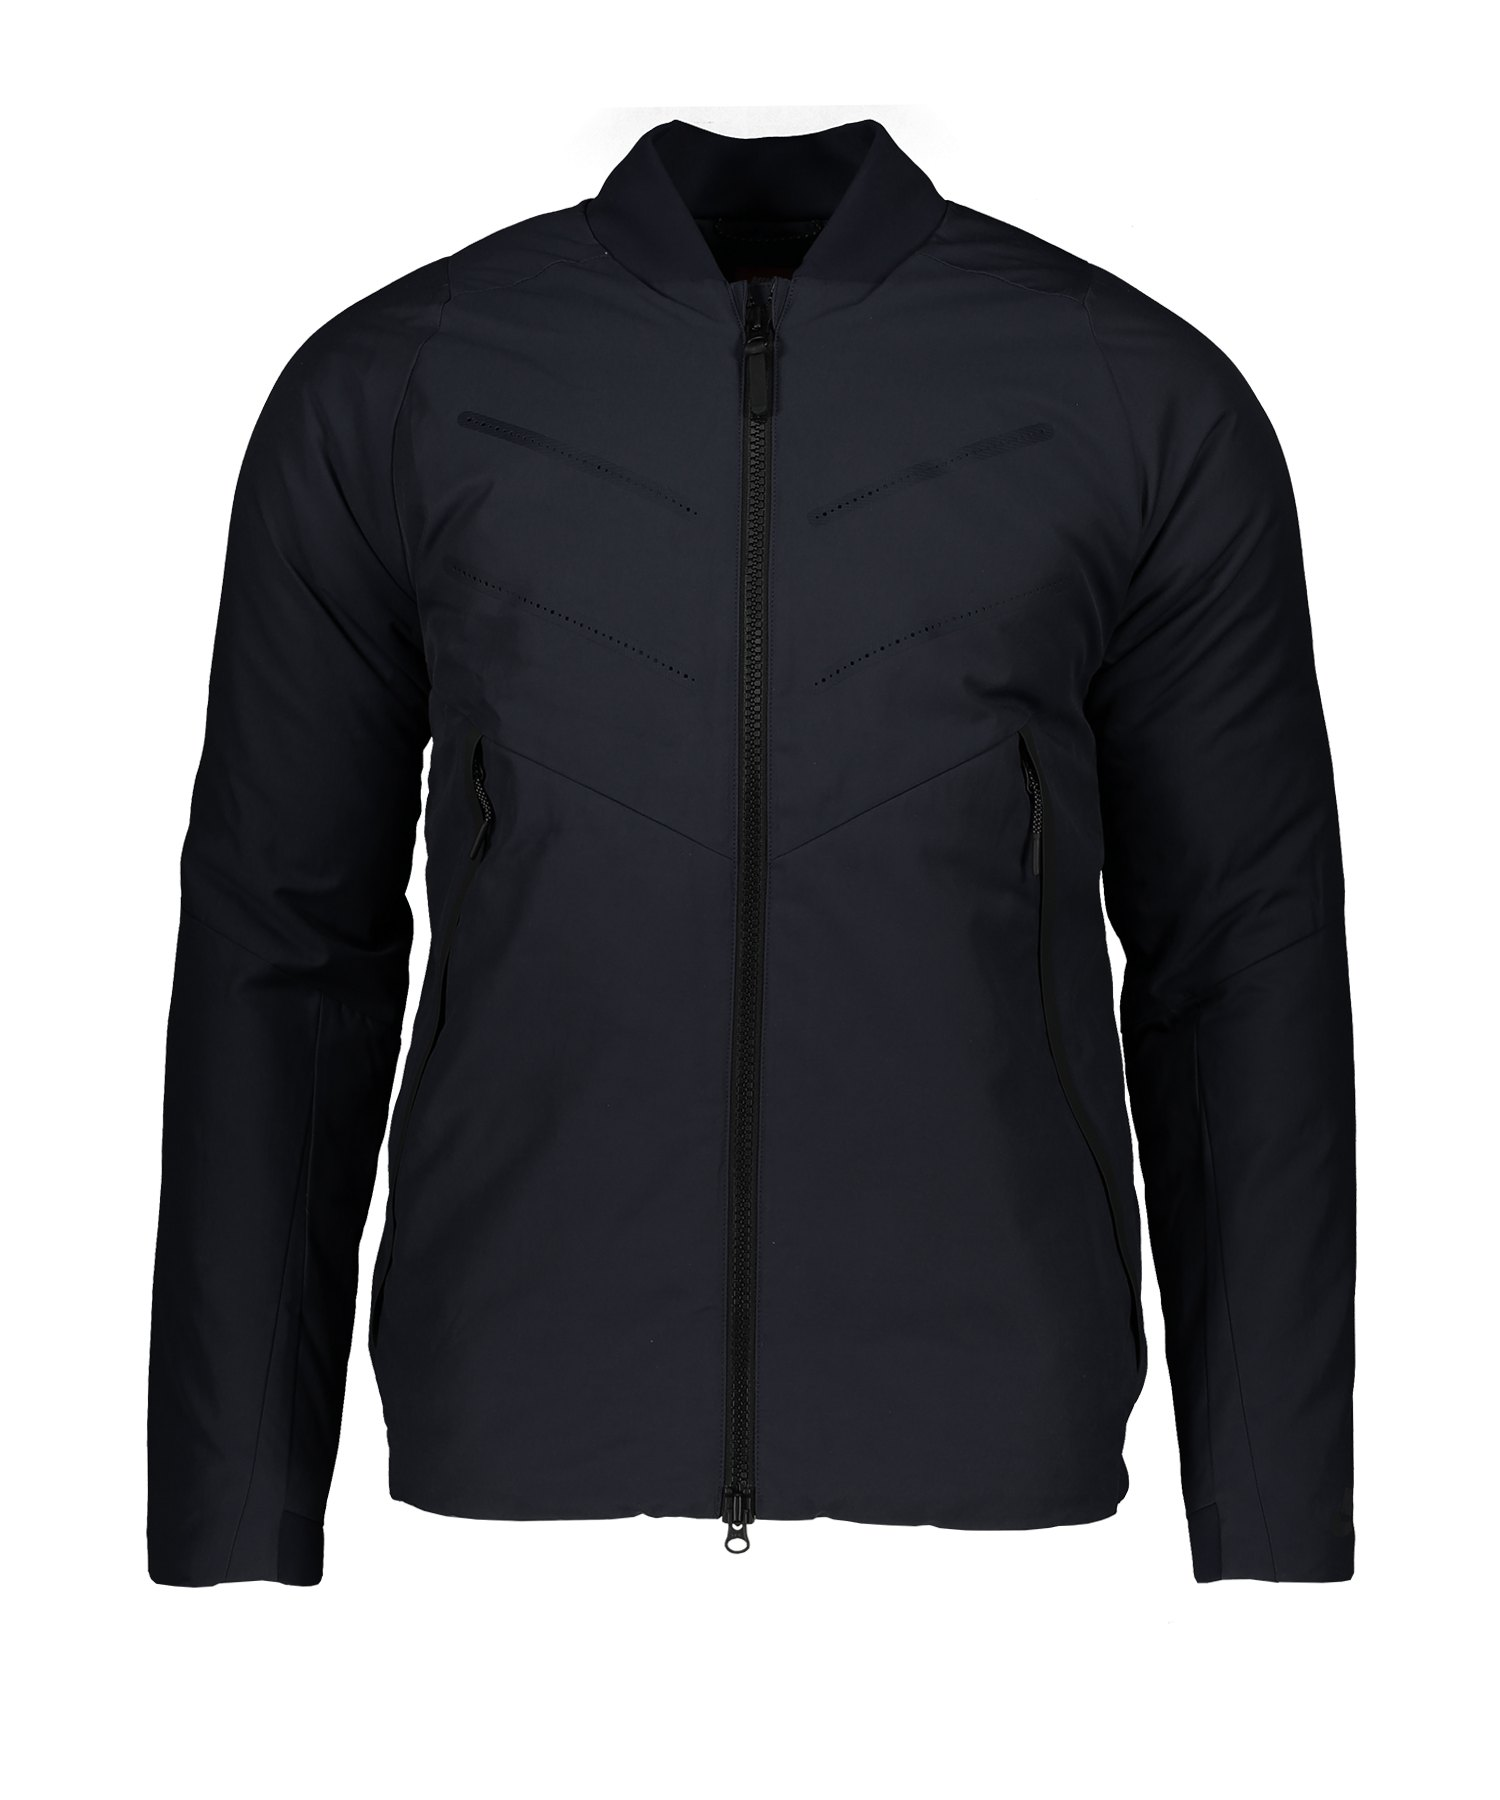 Nike AeroLoft Bomber Jacket Jacke Schwarz F010 - schwarz